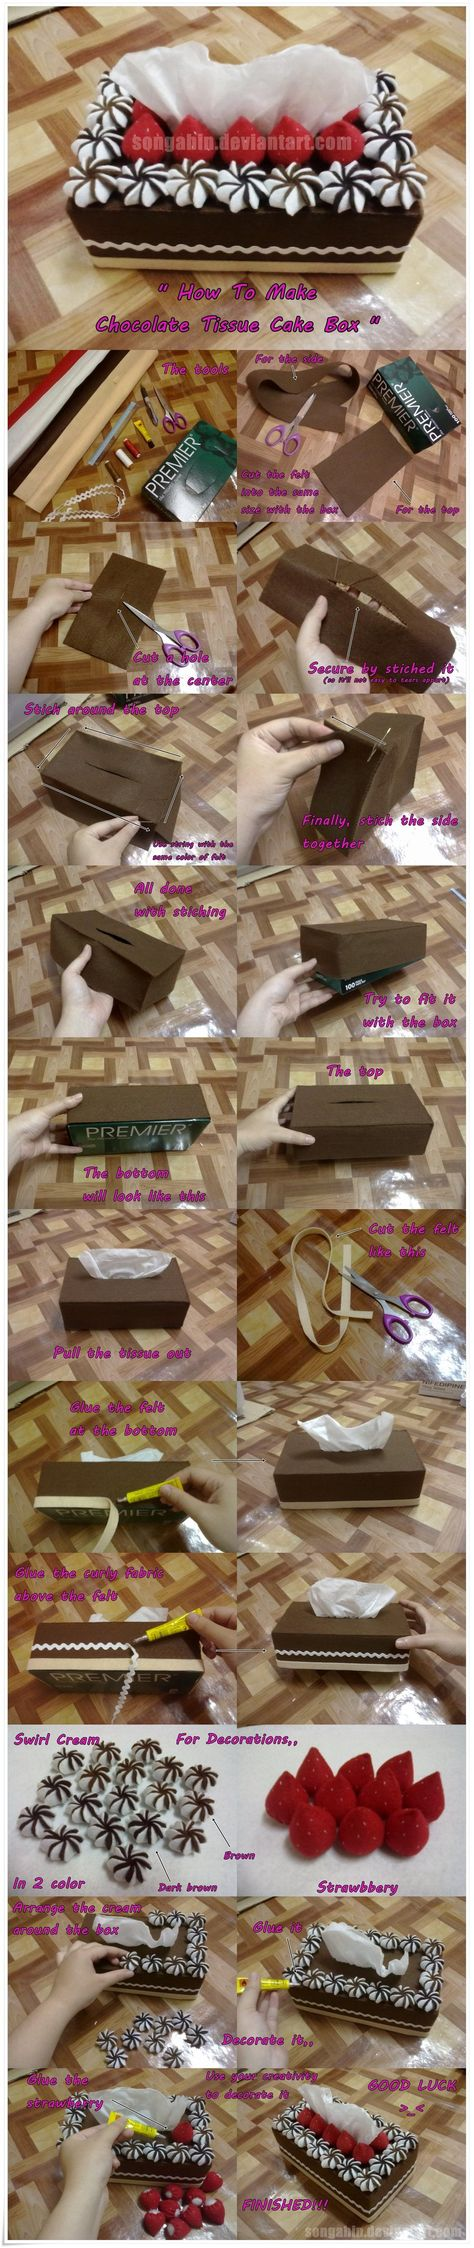 Chocolate Tissue Cake Box.. by ~SongAhIn on deviantART